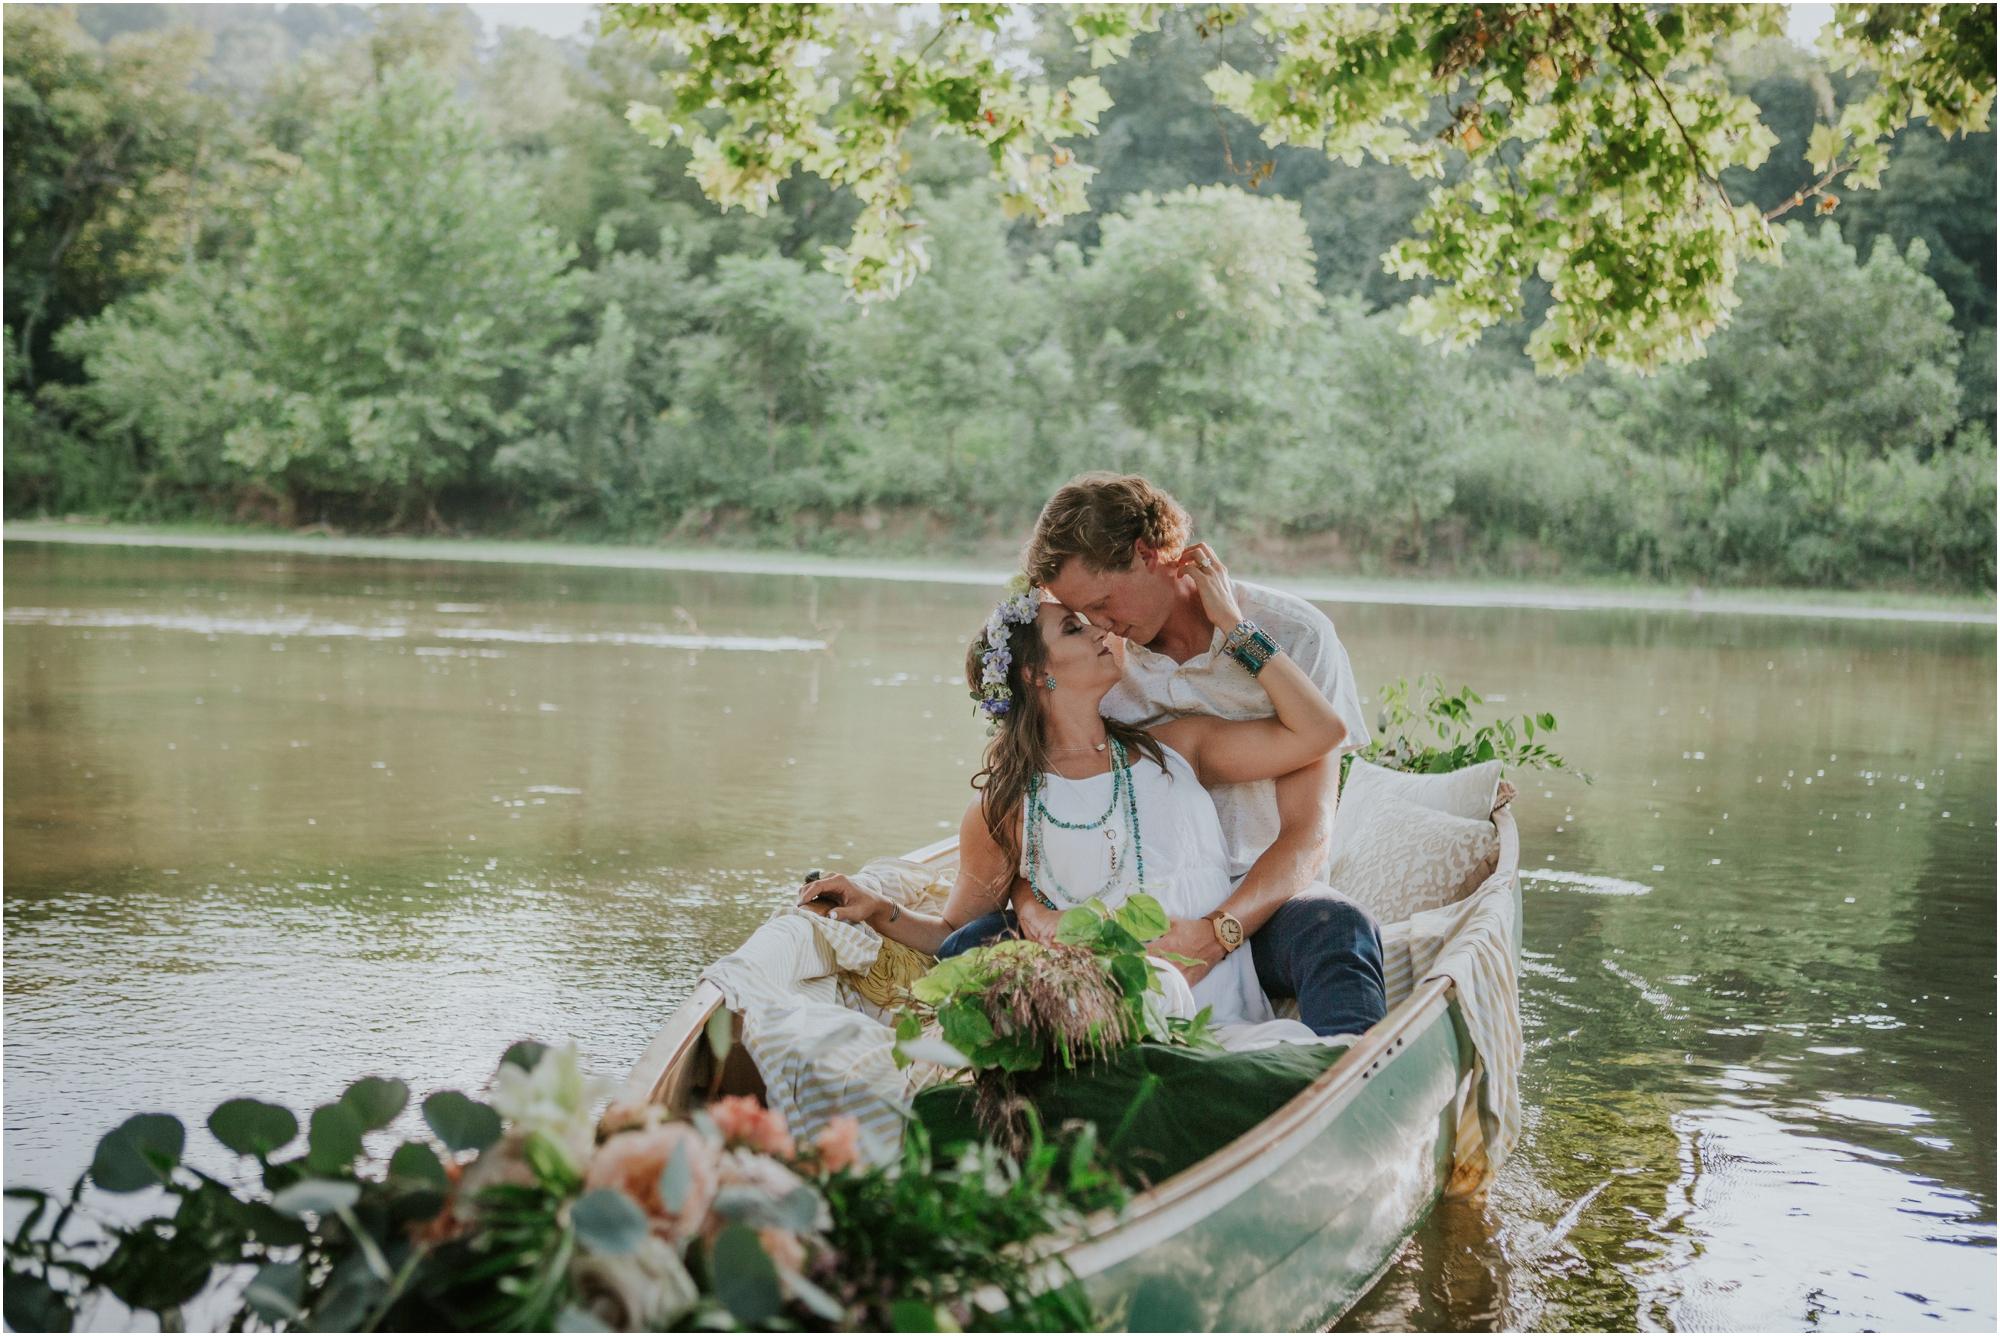 homestead-on-the-holston-hiltons-virginia-bohemian-canoe-styled-shoot-northeast-tennessee-elopement-wild-free-spirit_0007.jpg